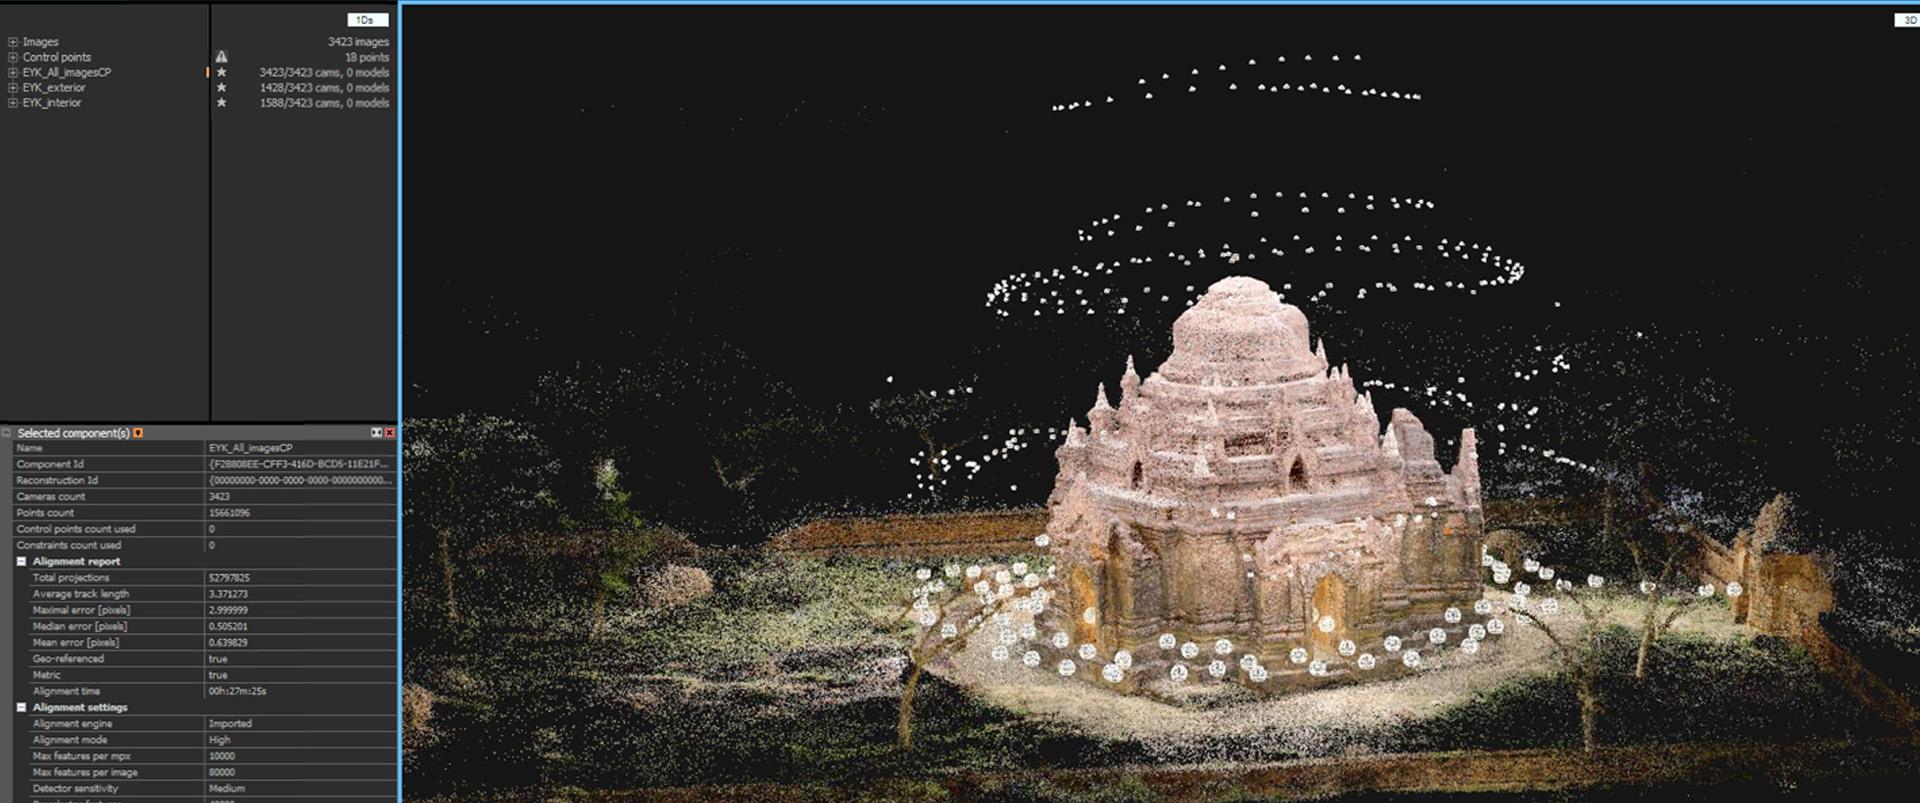 Page CulturalHeritage-Architecture - CapturingReality com